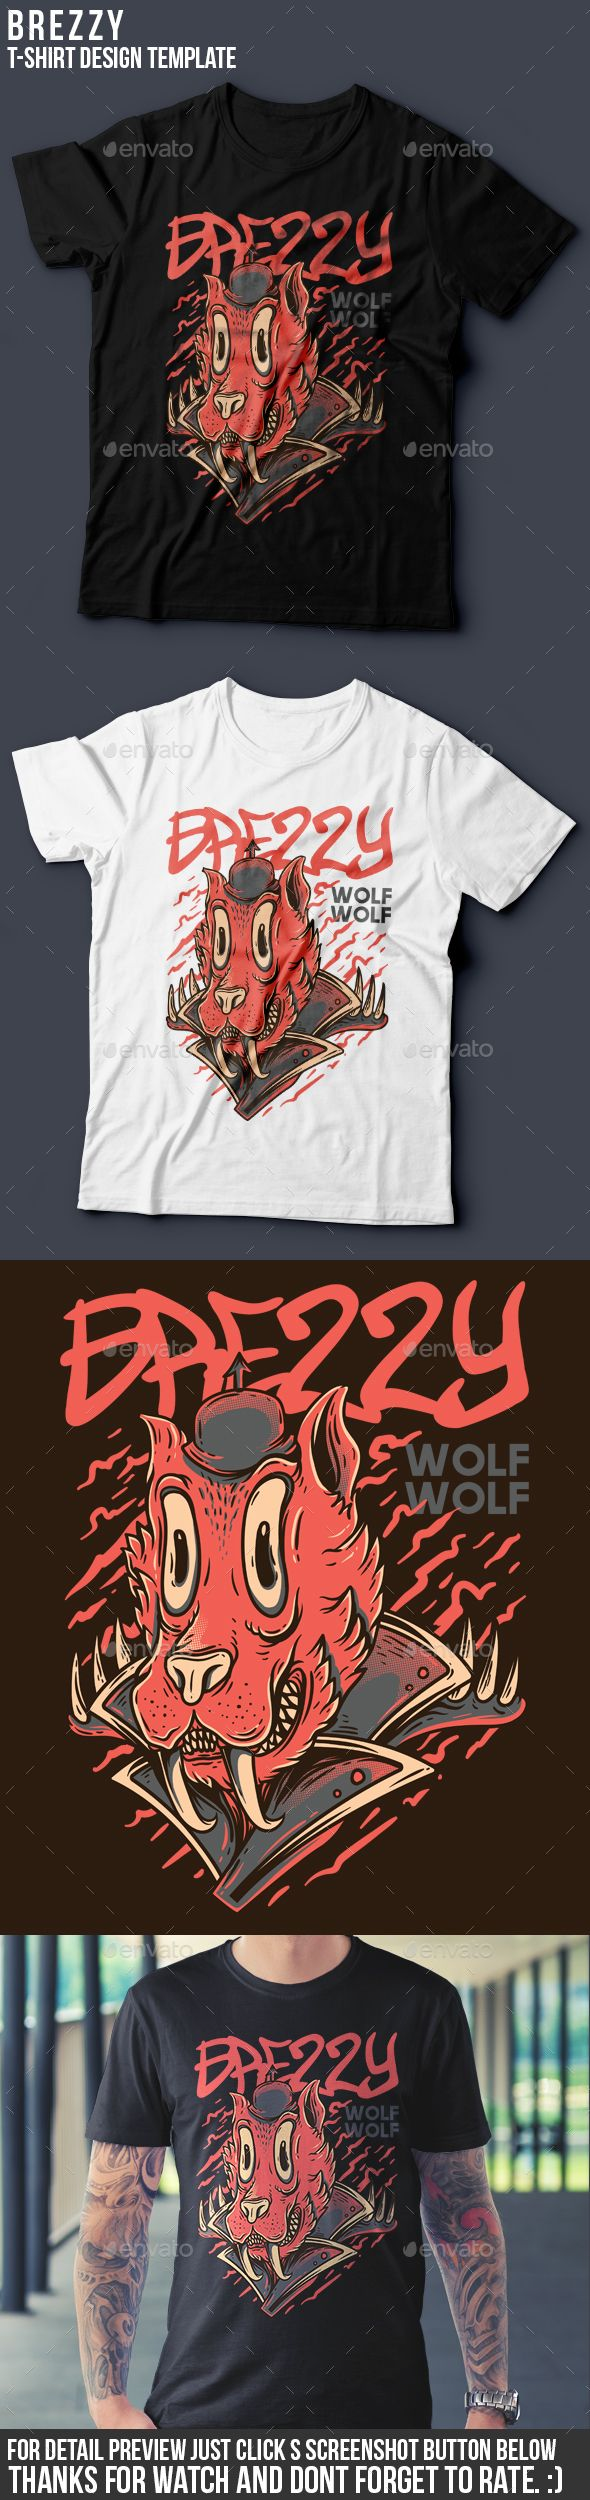 Shirt design rates - Brezzy T Shirt Design